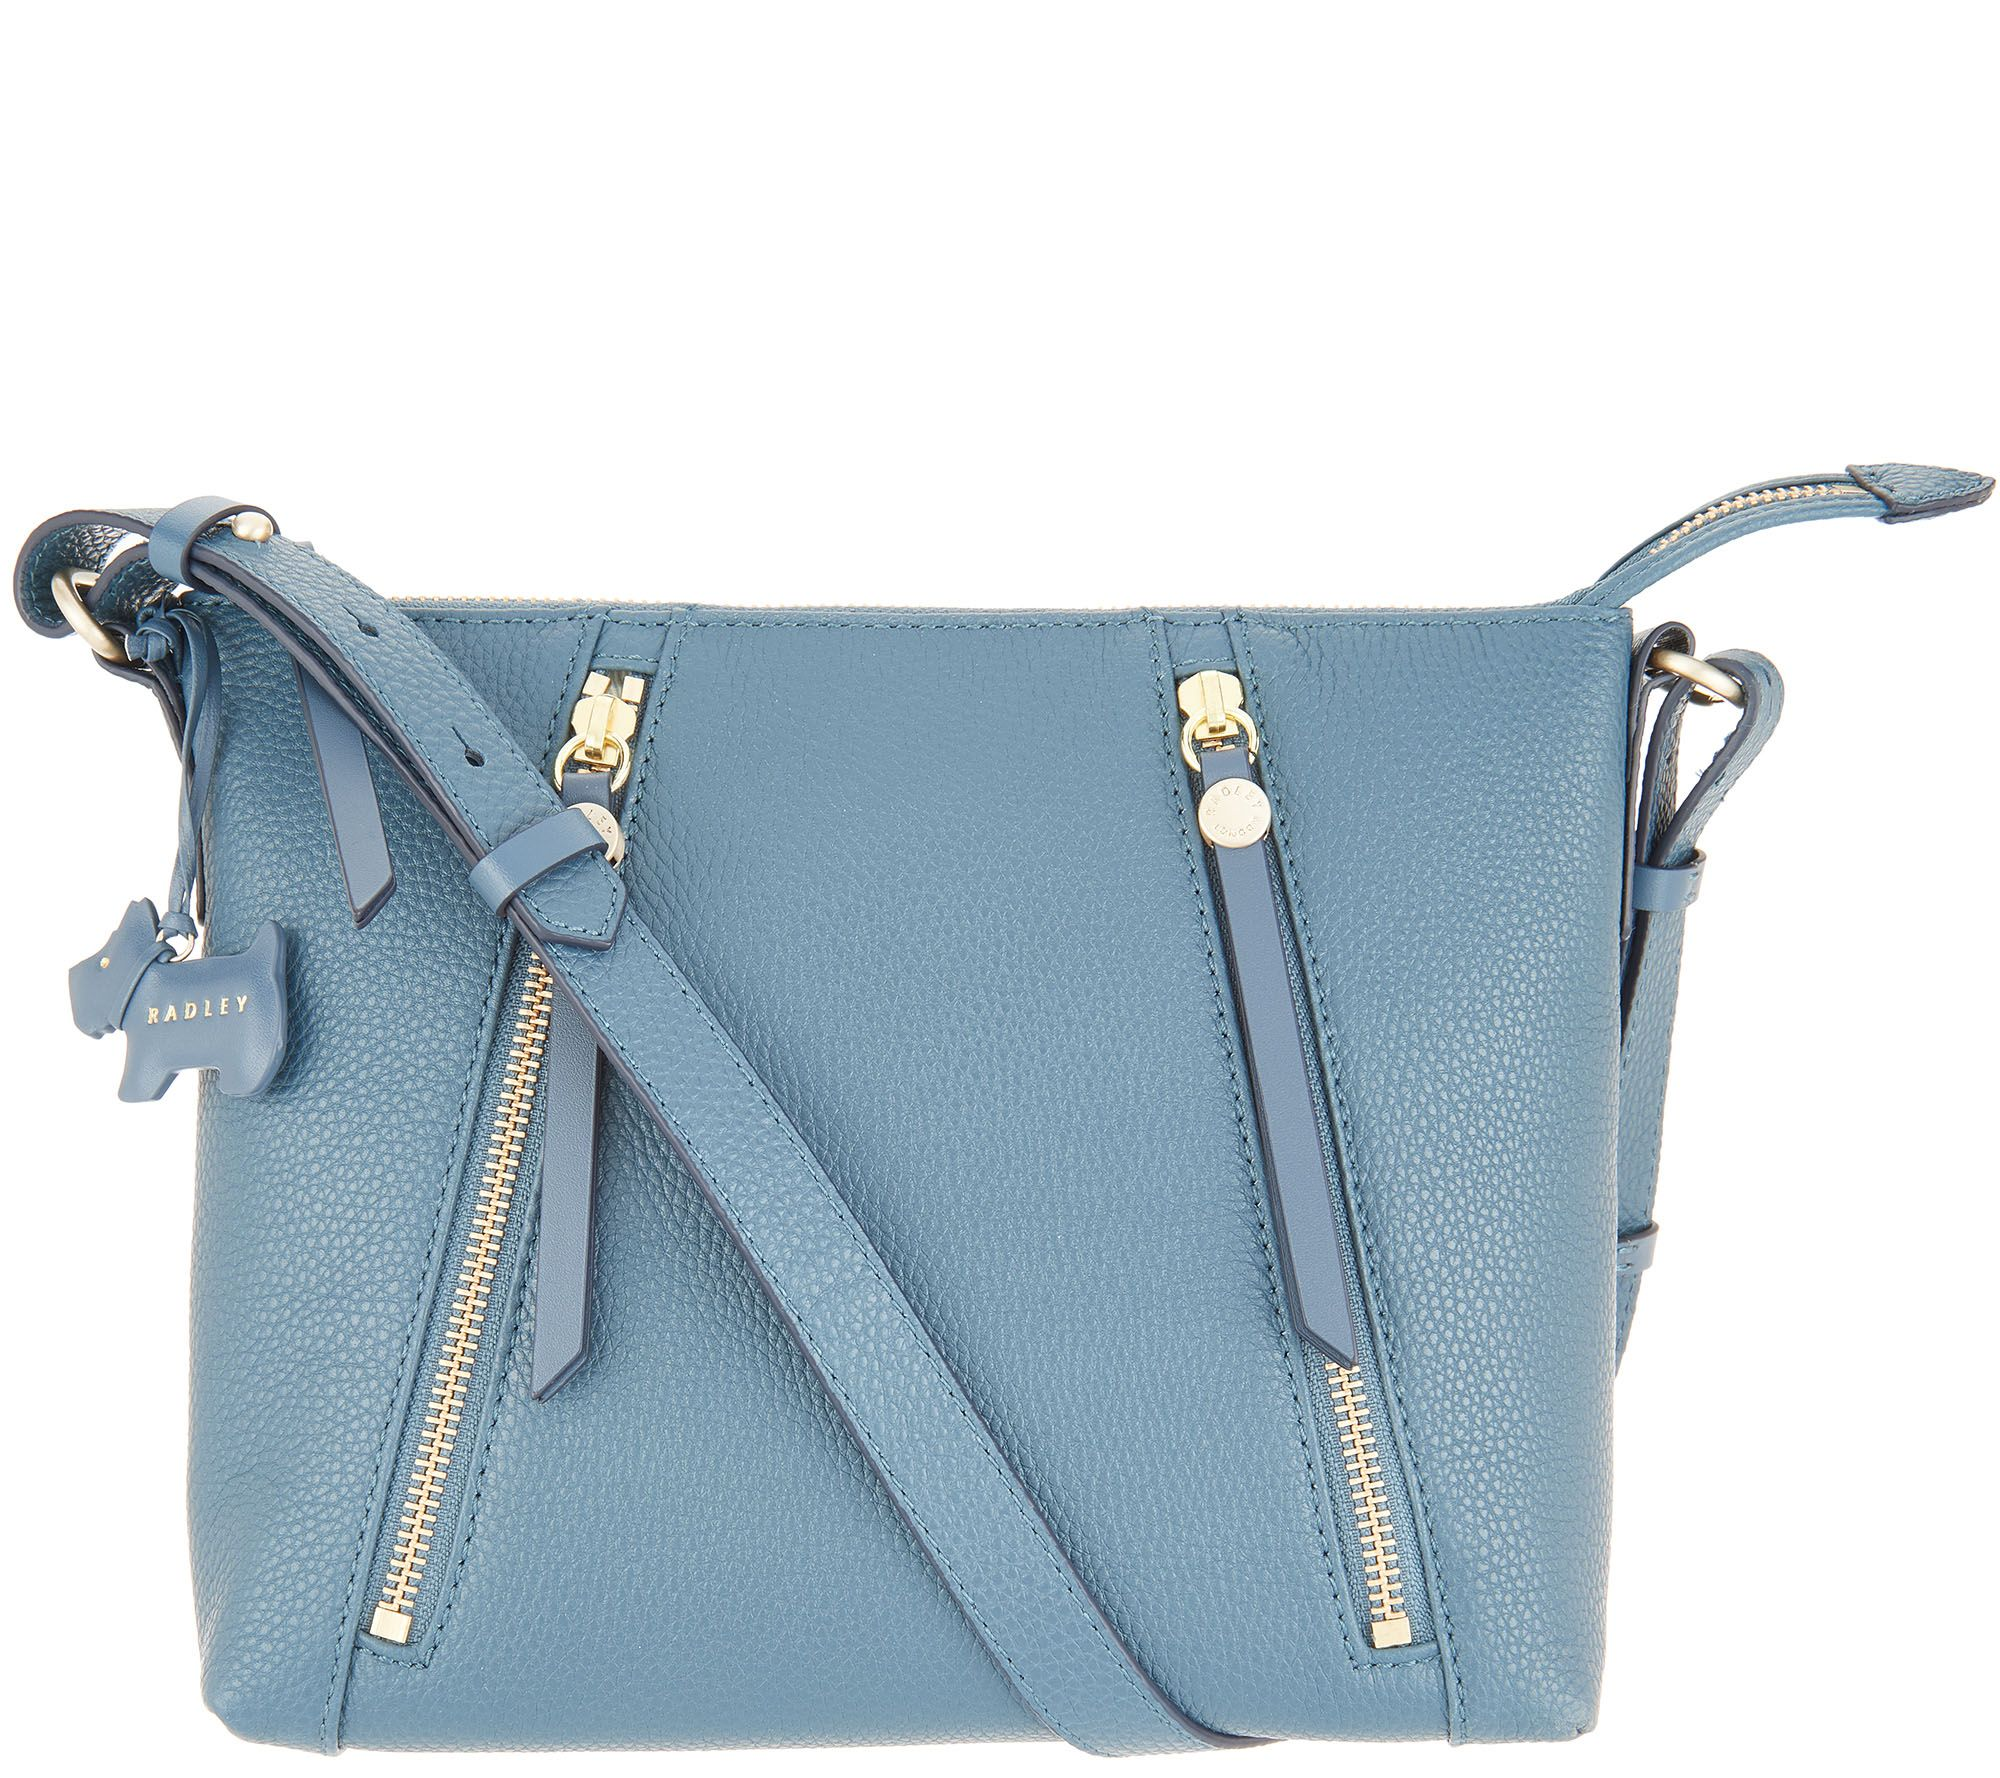 63a9e81ff1b1 RADLEY London Fountain Road Leather Crossbody Handbag - Page 1 — QVC.com